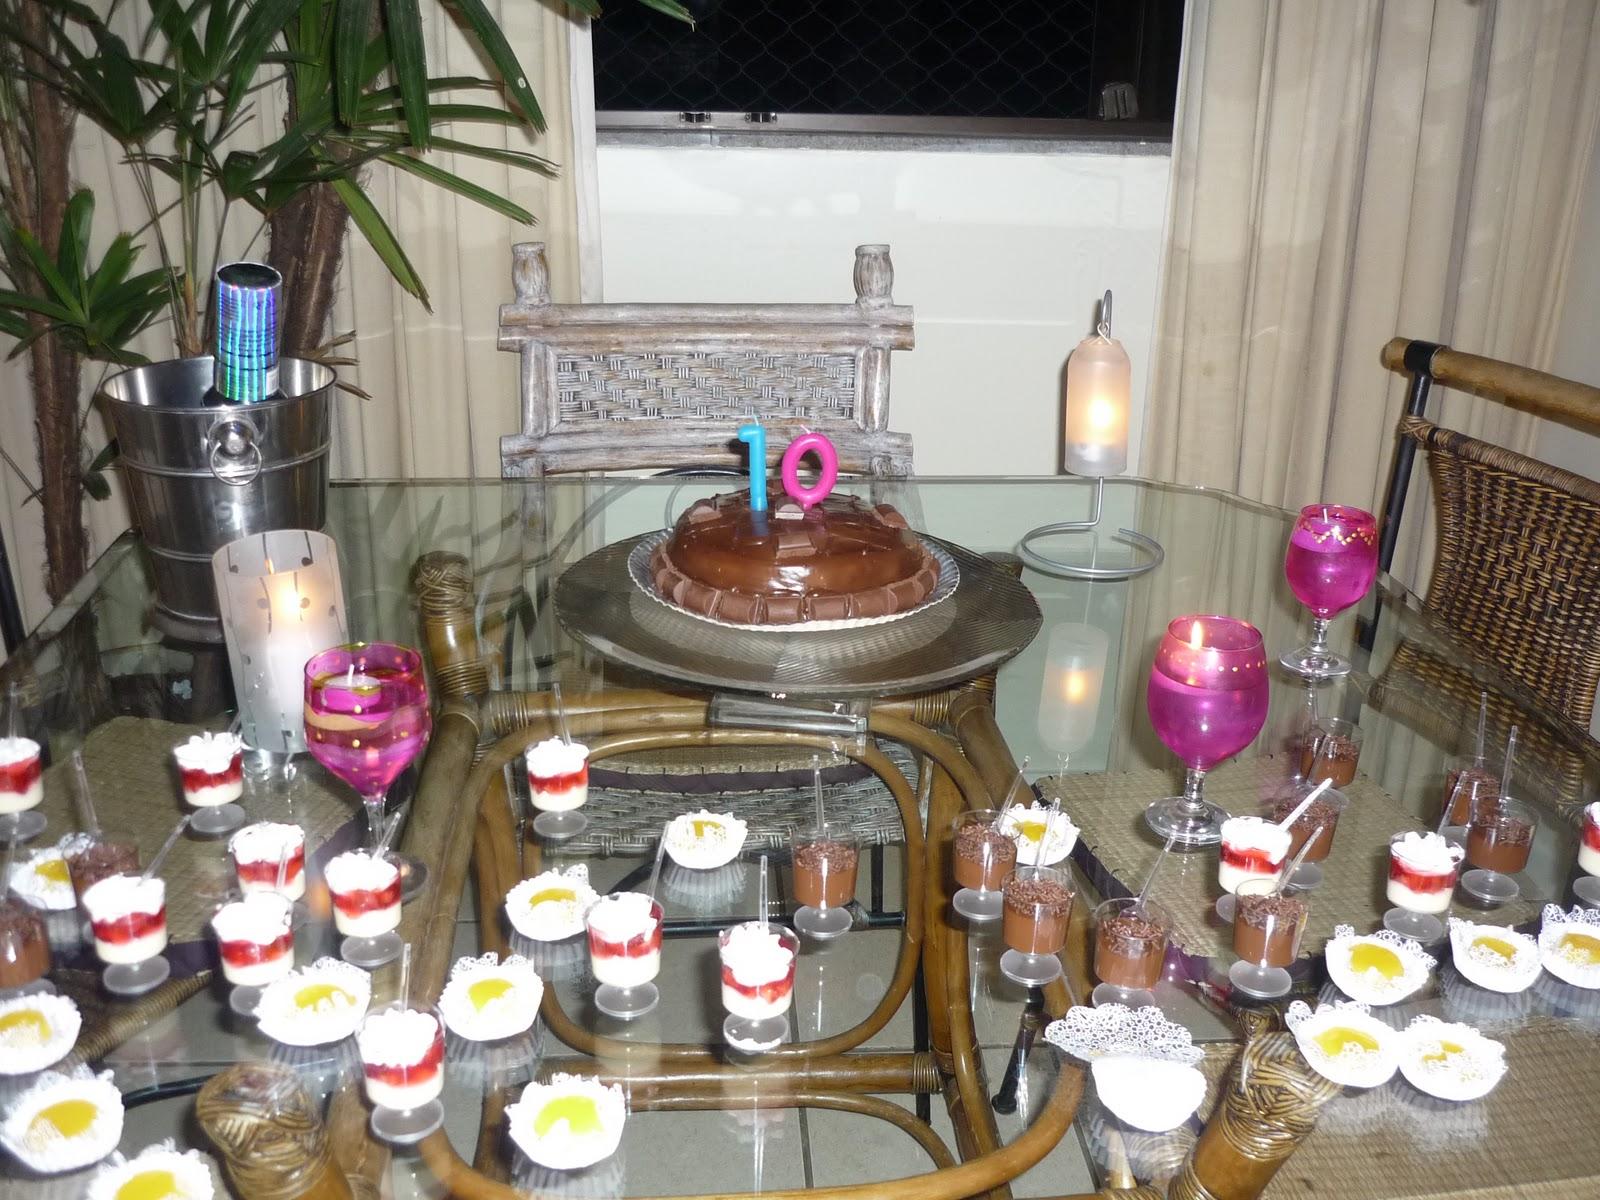 http://4.bp.blogspot.com/-V0vKKFlu-bg/TVoHyEAMRRI/AAAAAAAADII/ZY_8uYM88p8/s1600/Festa+do+pijama+039.JPG